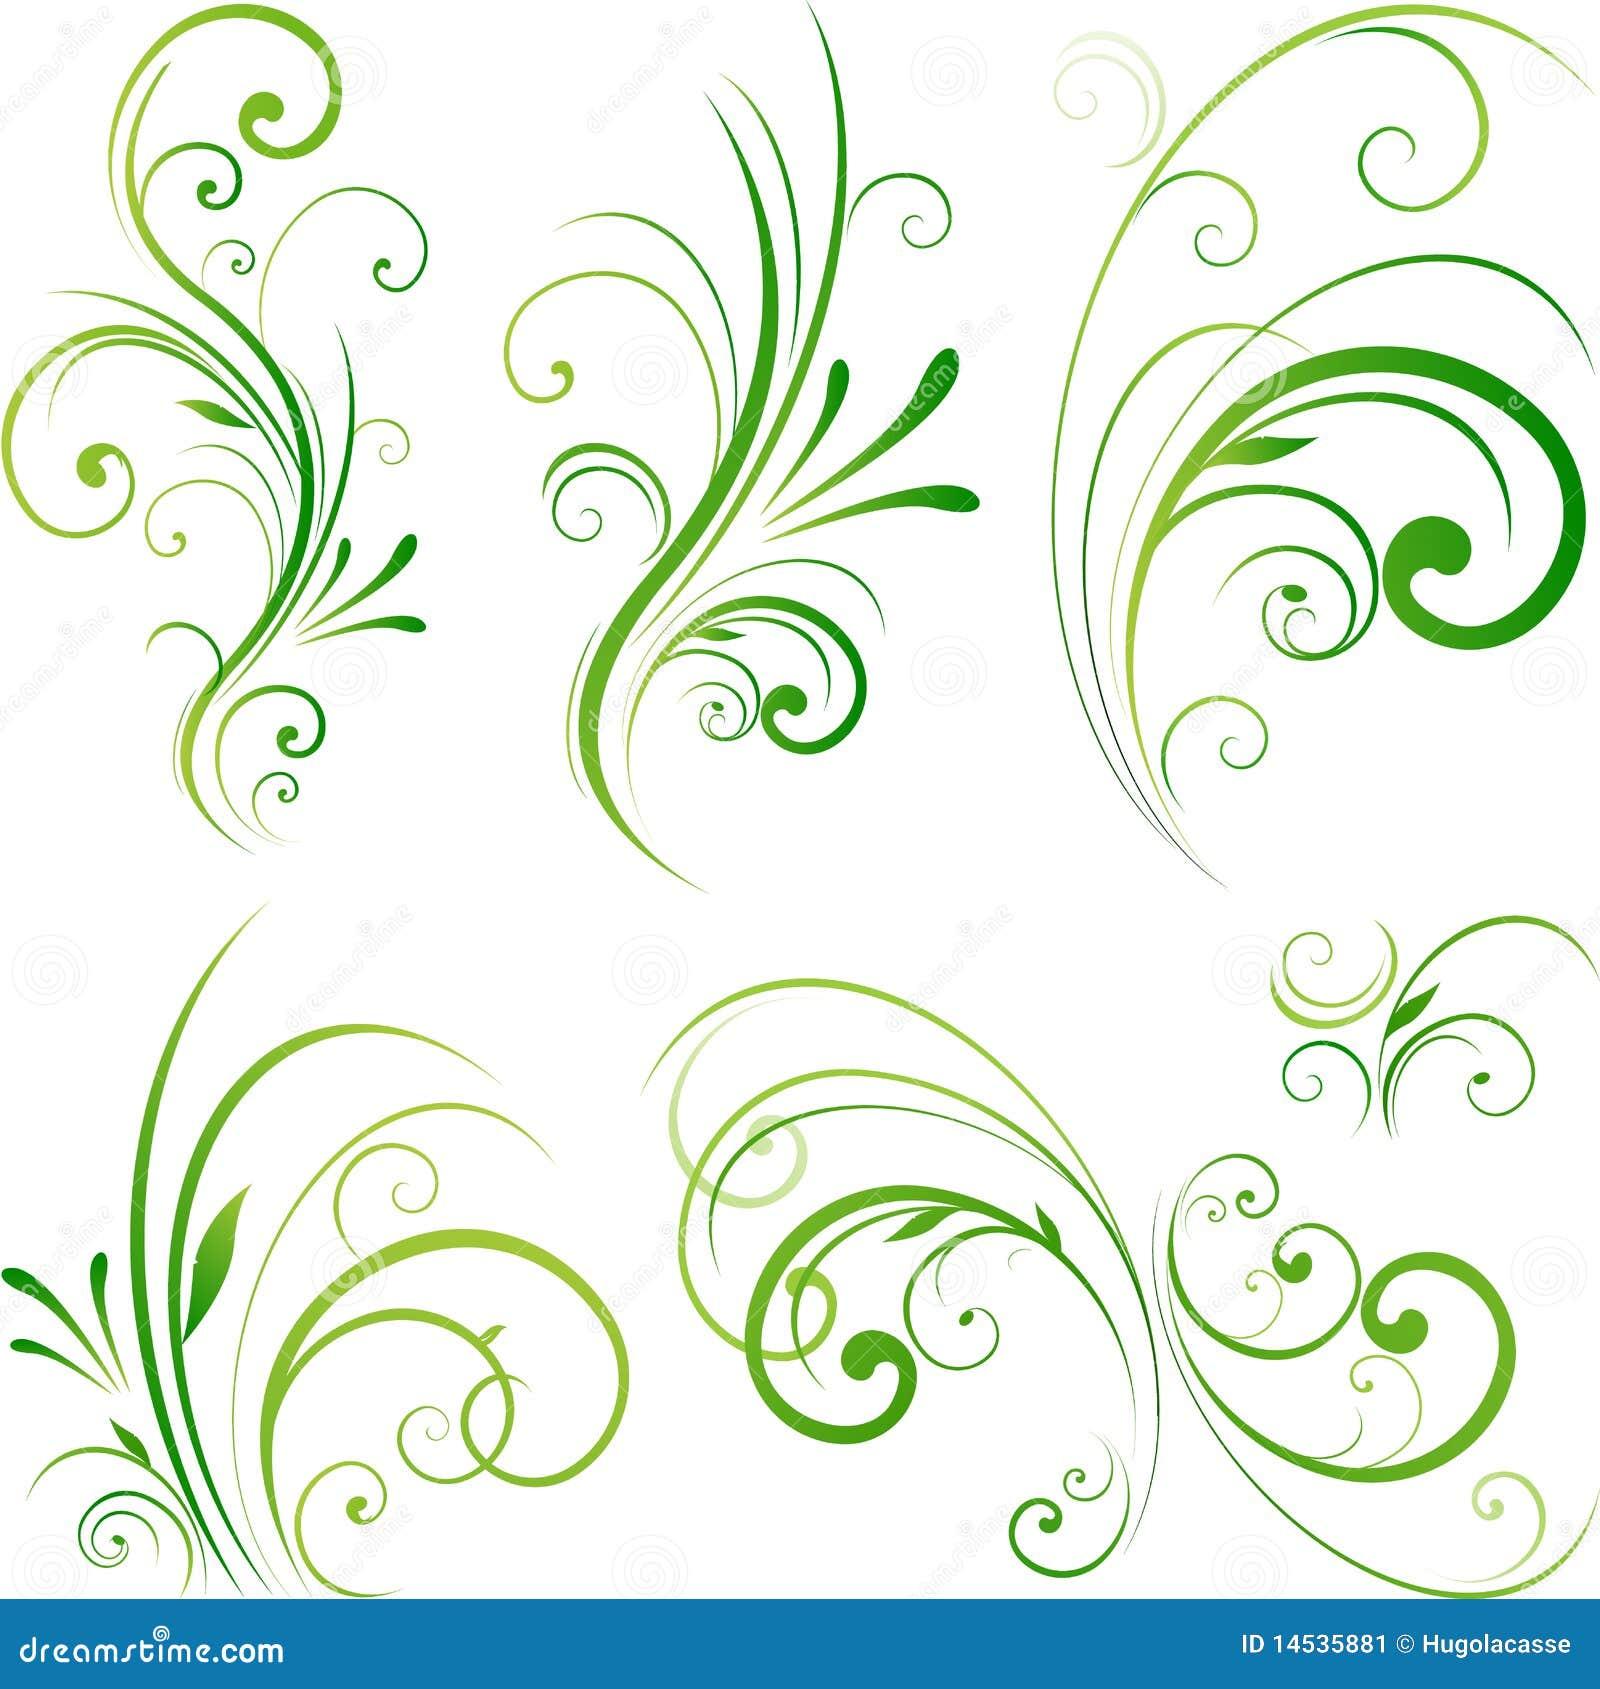 nature design element illustration 14535881 megapixl